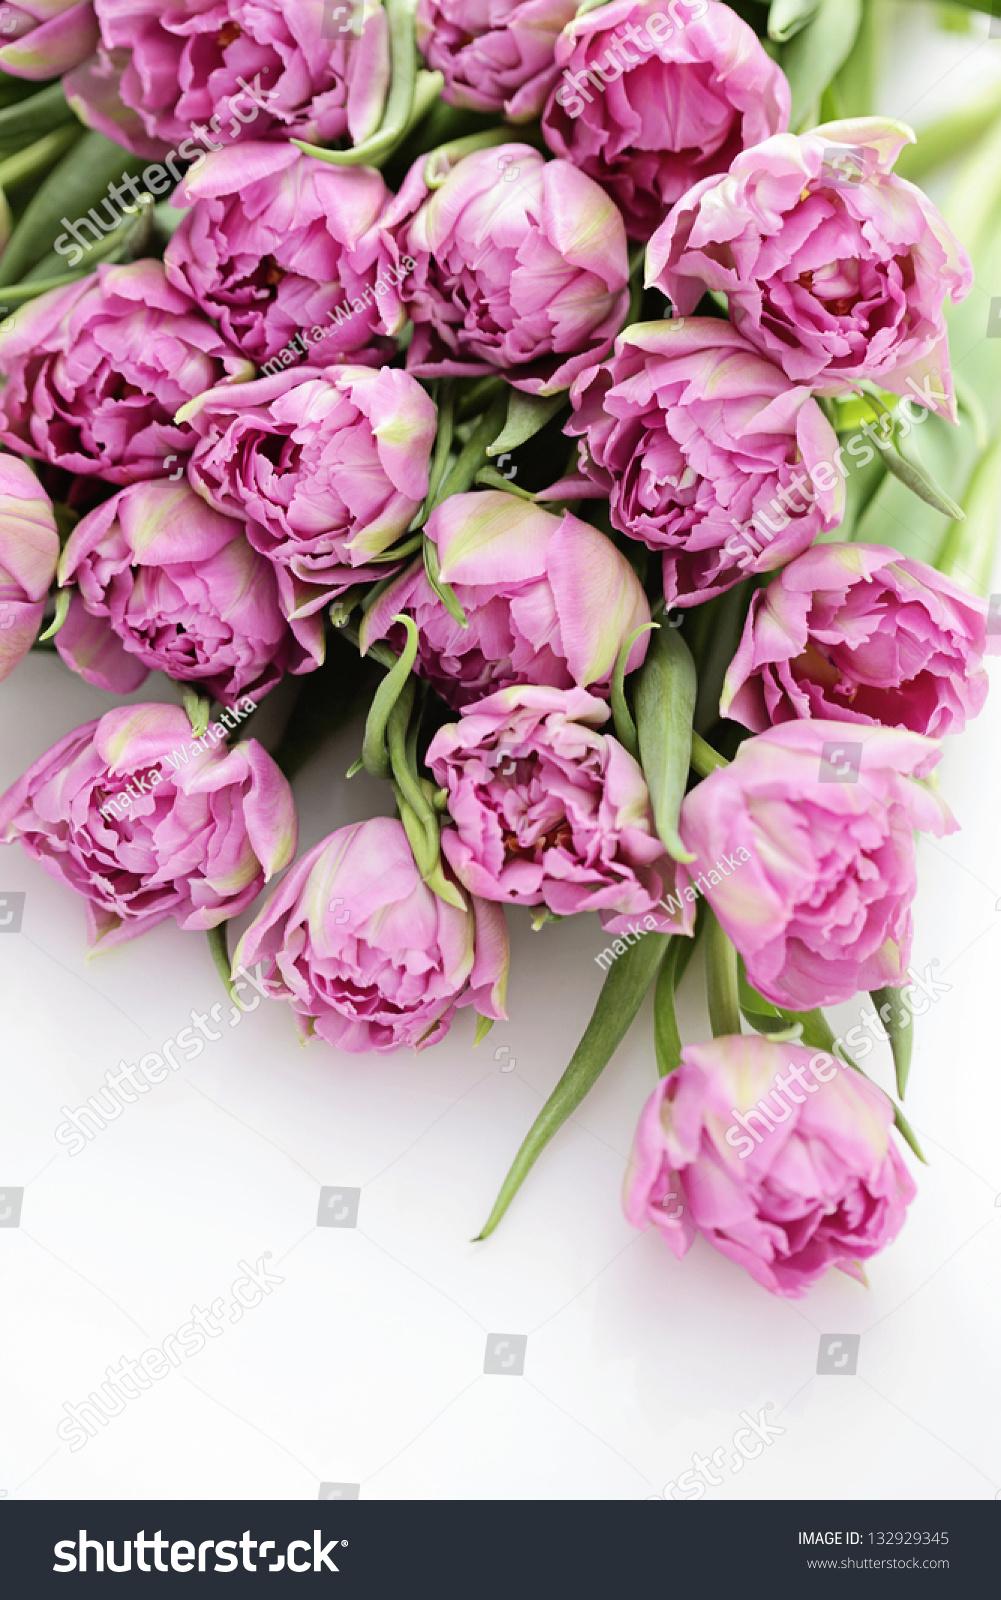 Lovely Pink Tulips Flowers Plants Stock Photo 132929345 Shutterstock